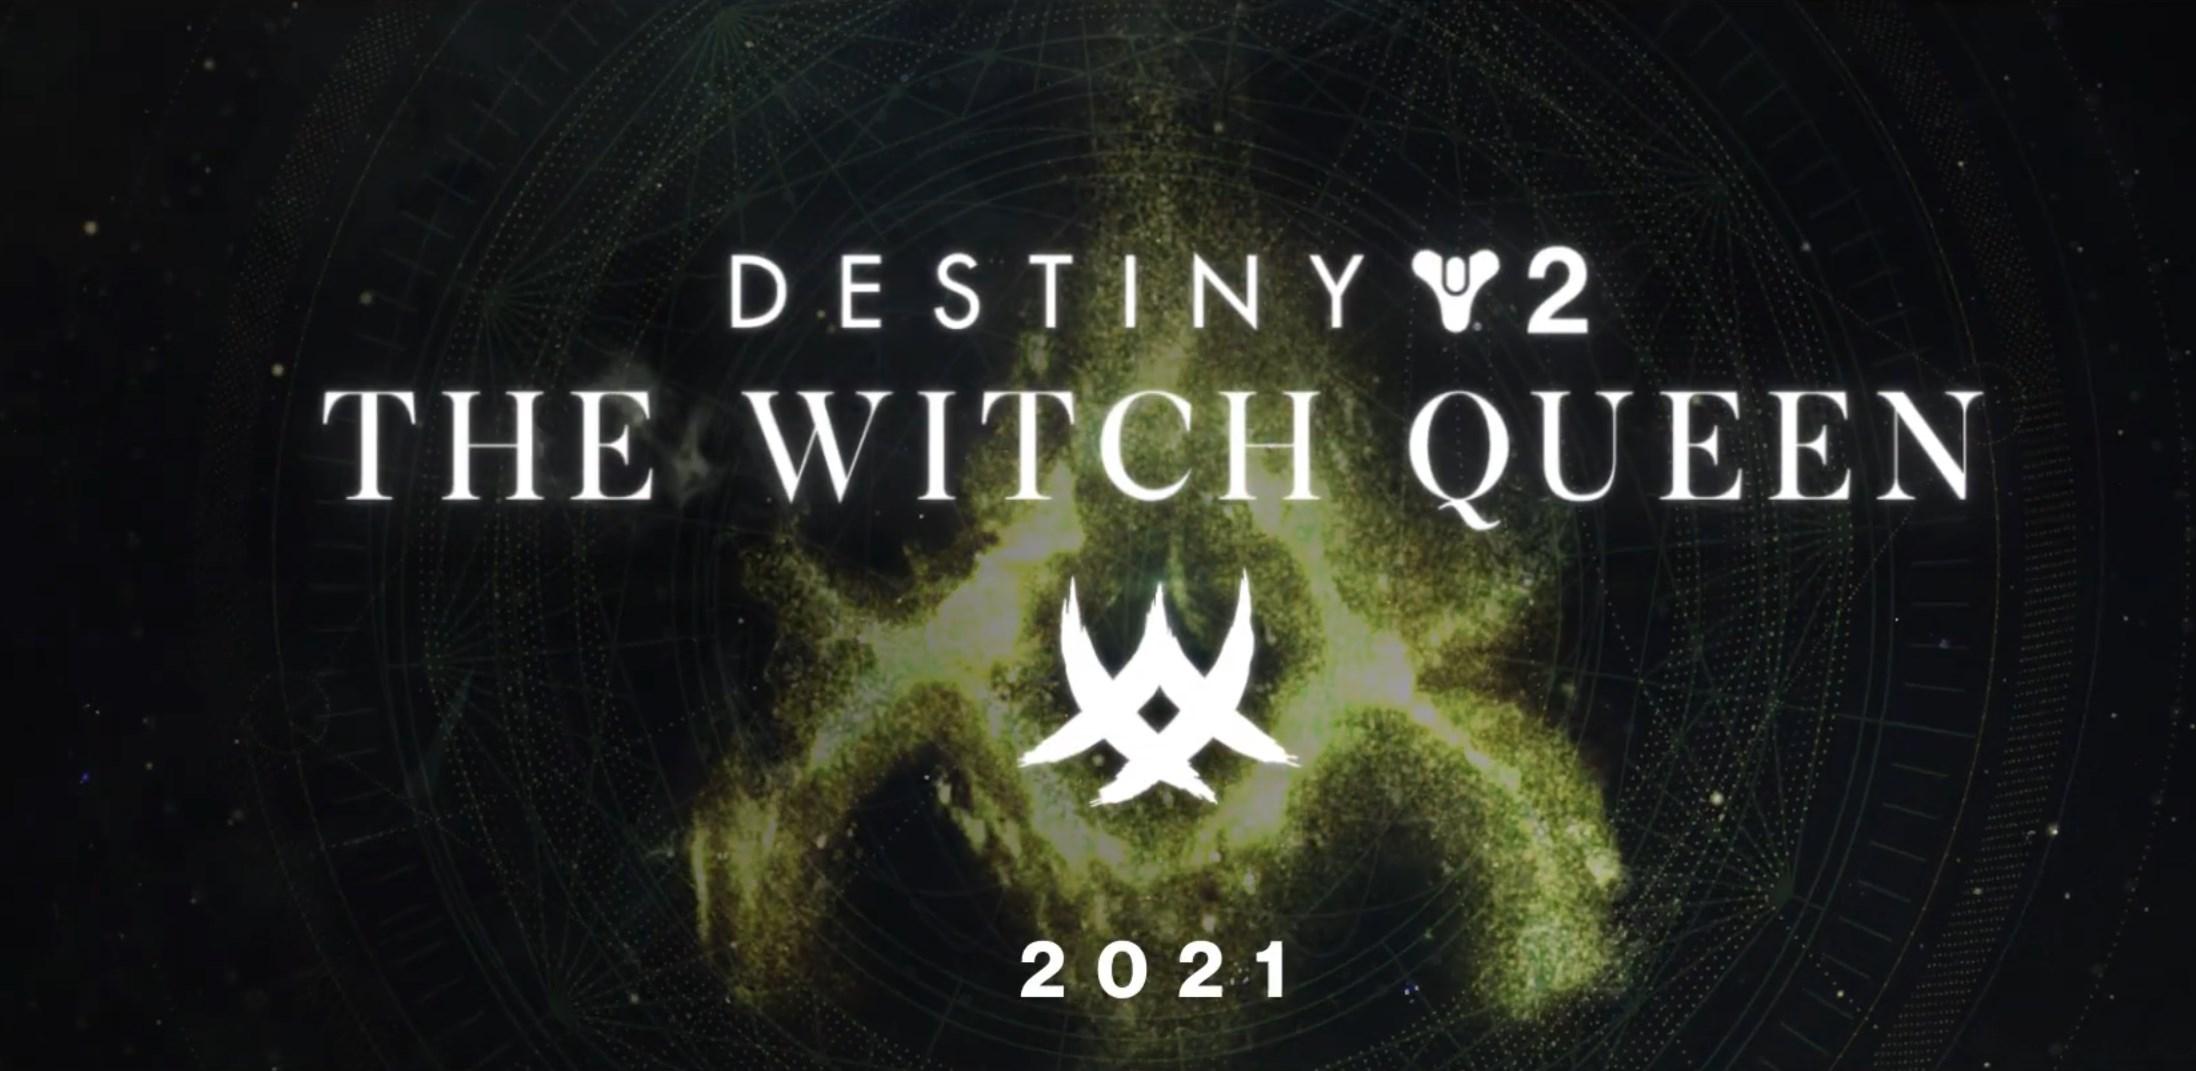 Destiny 2 Season 16 The Witch Queen